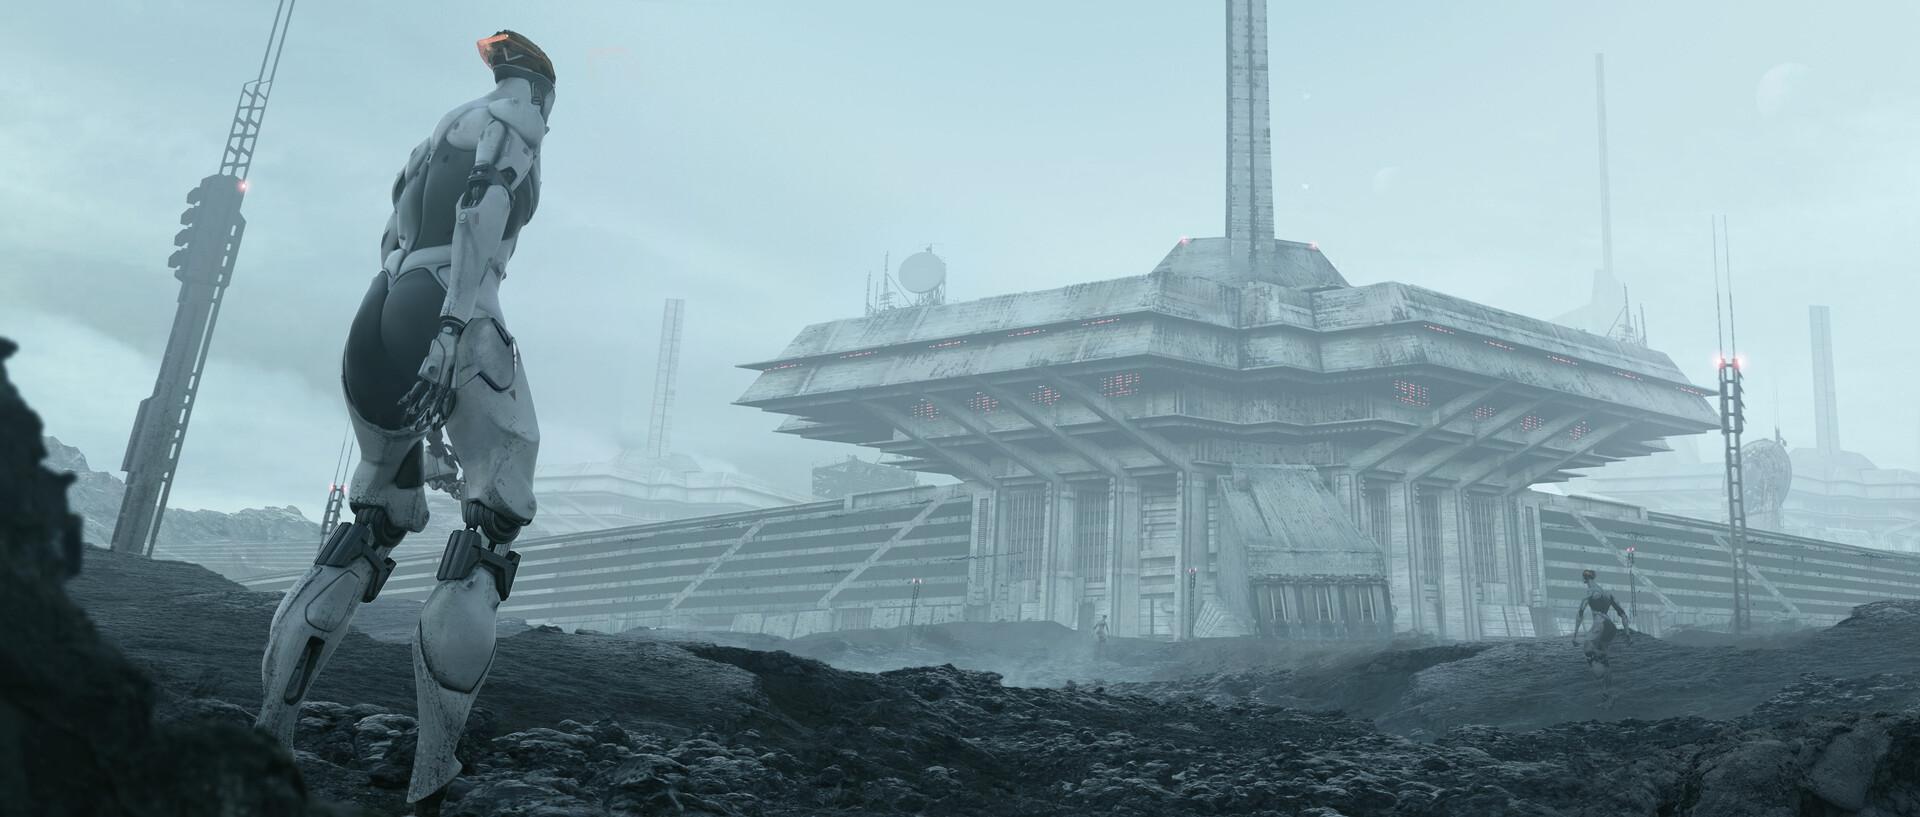 The Cinematic Sci-Fi Art of MV8